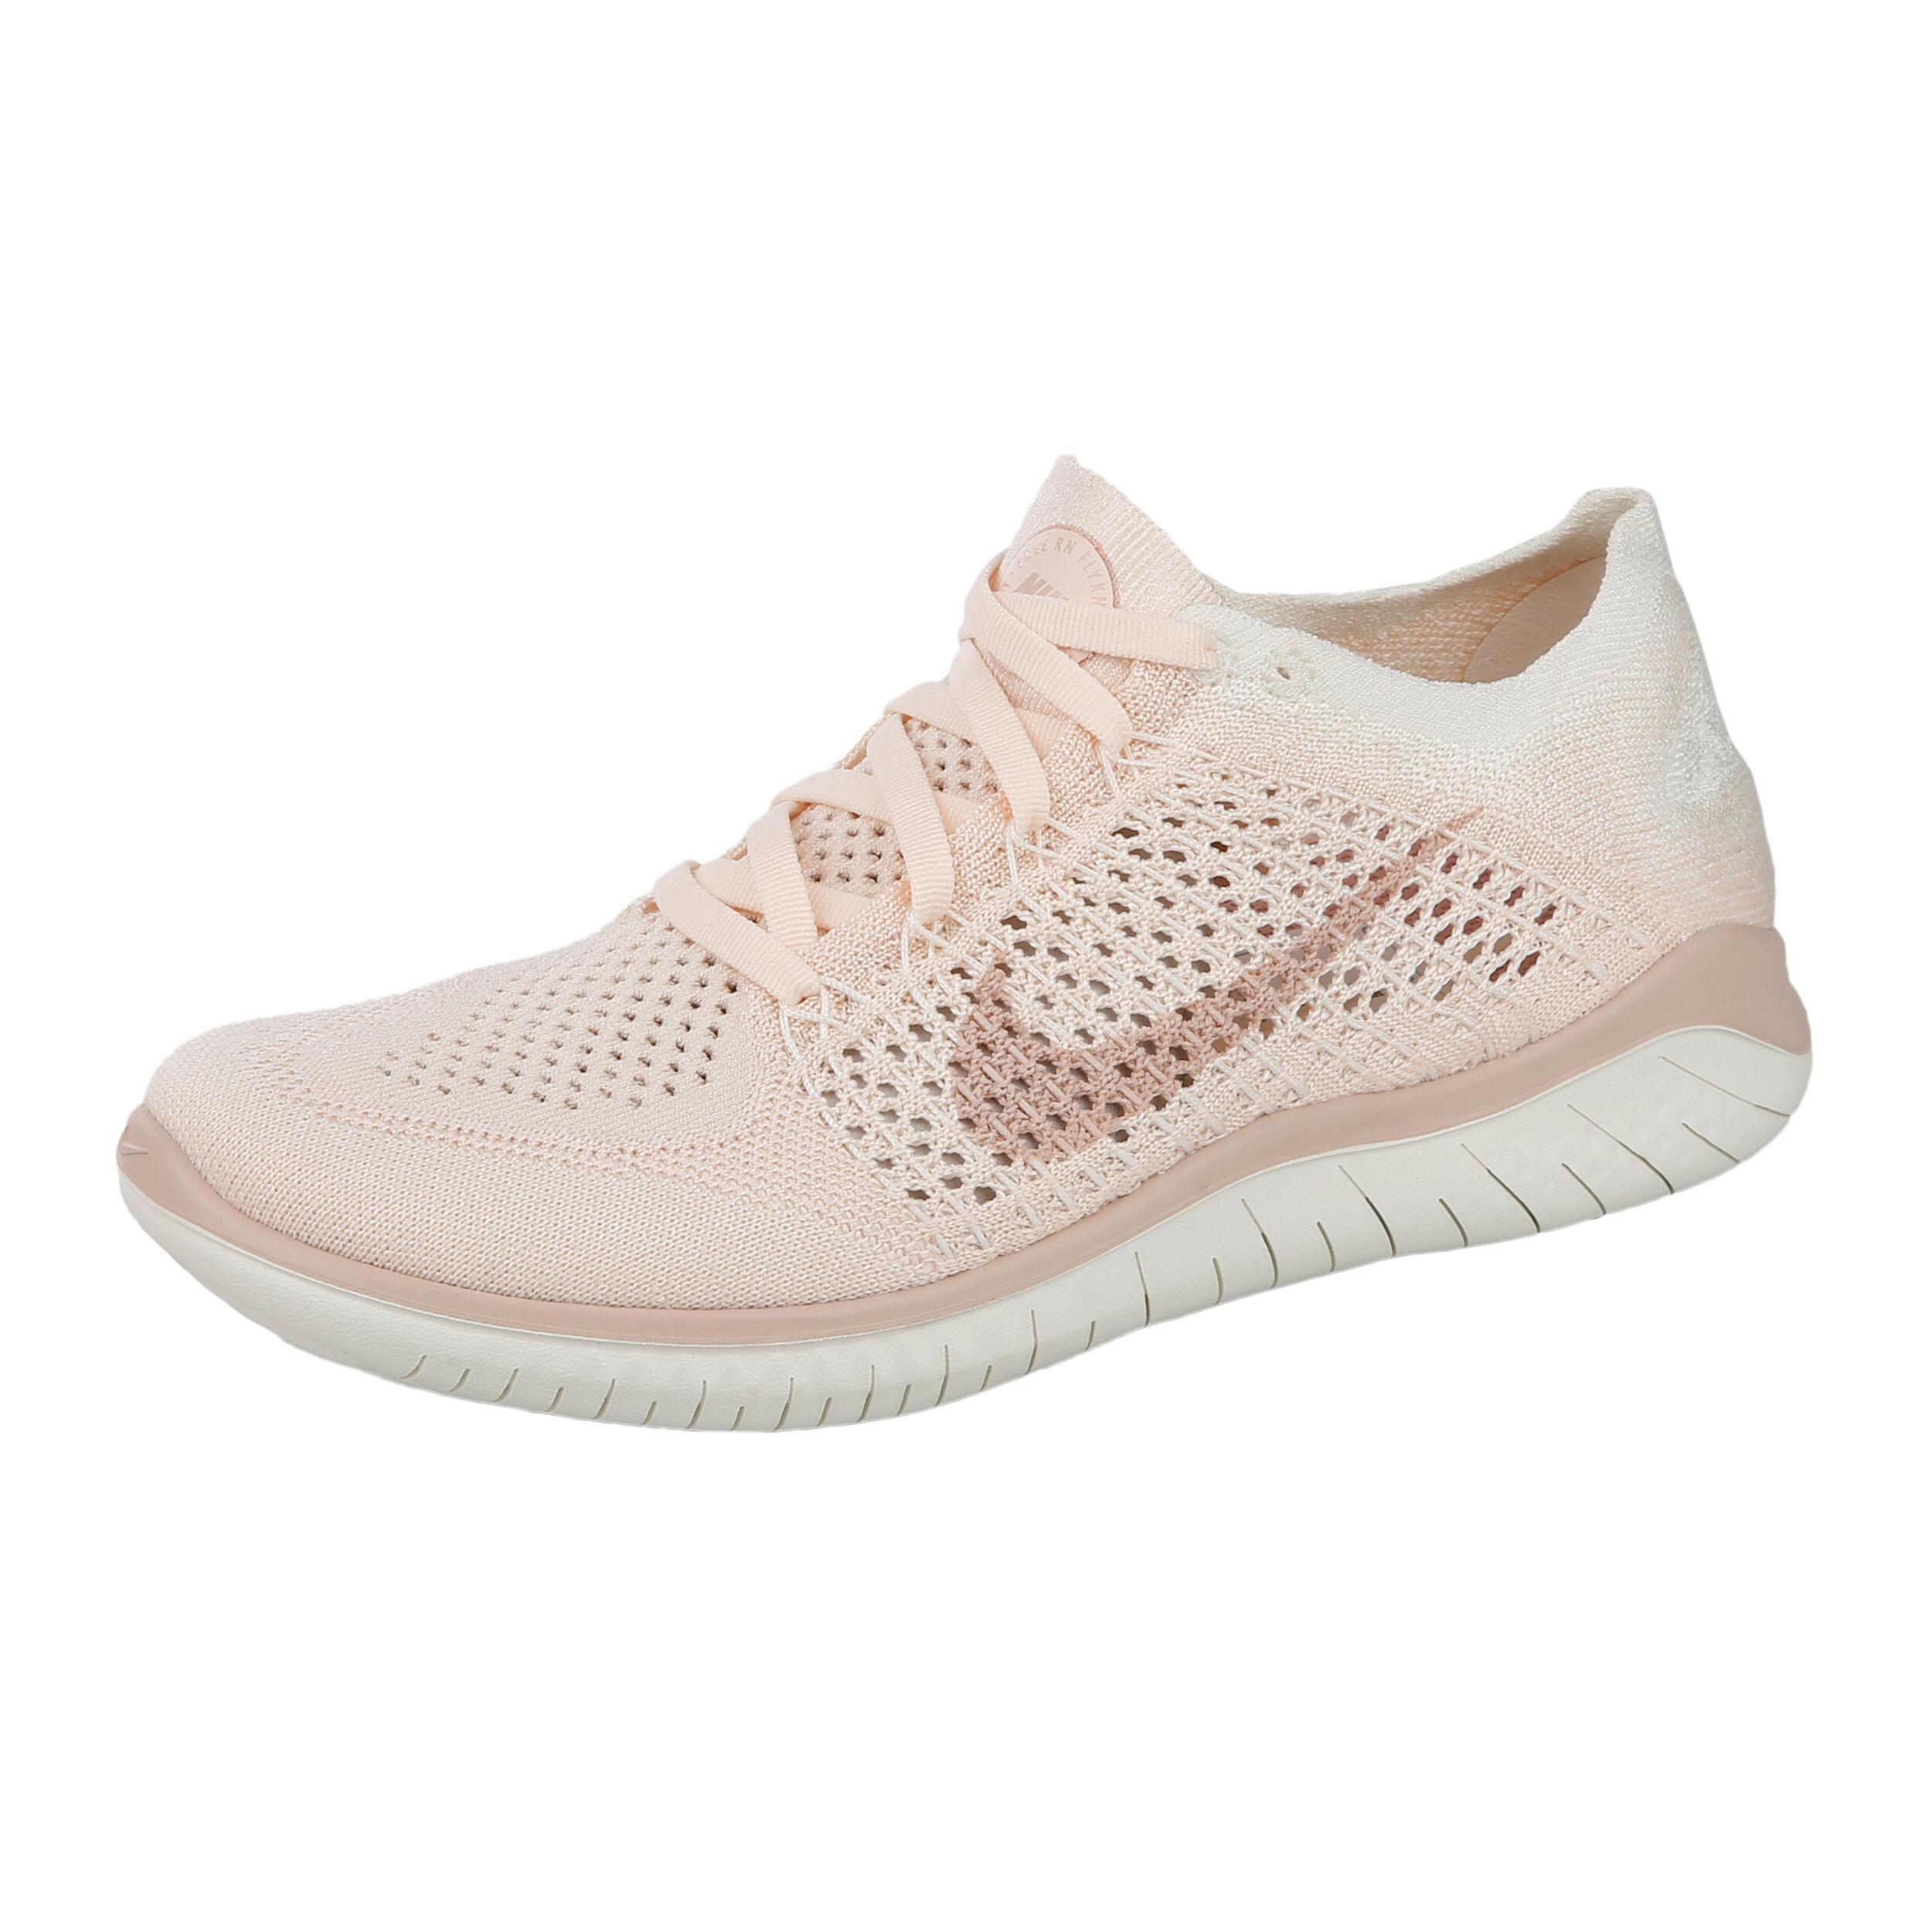 Nike Free Run Flyknit 2018 Fitnesssko Damer Creme, Rosa